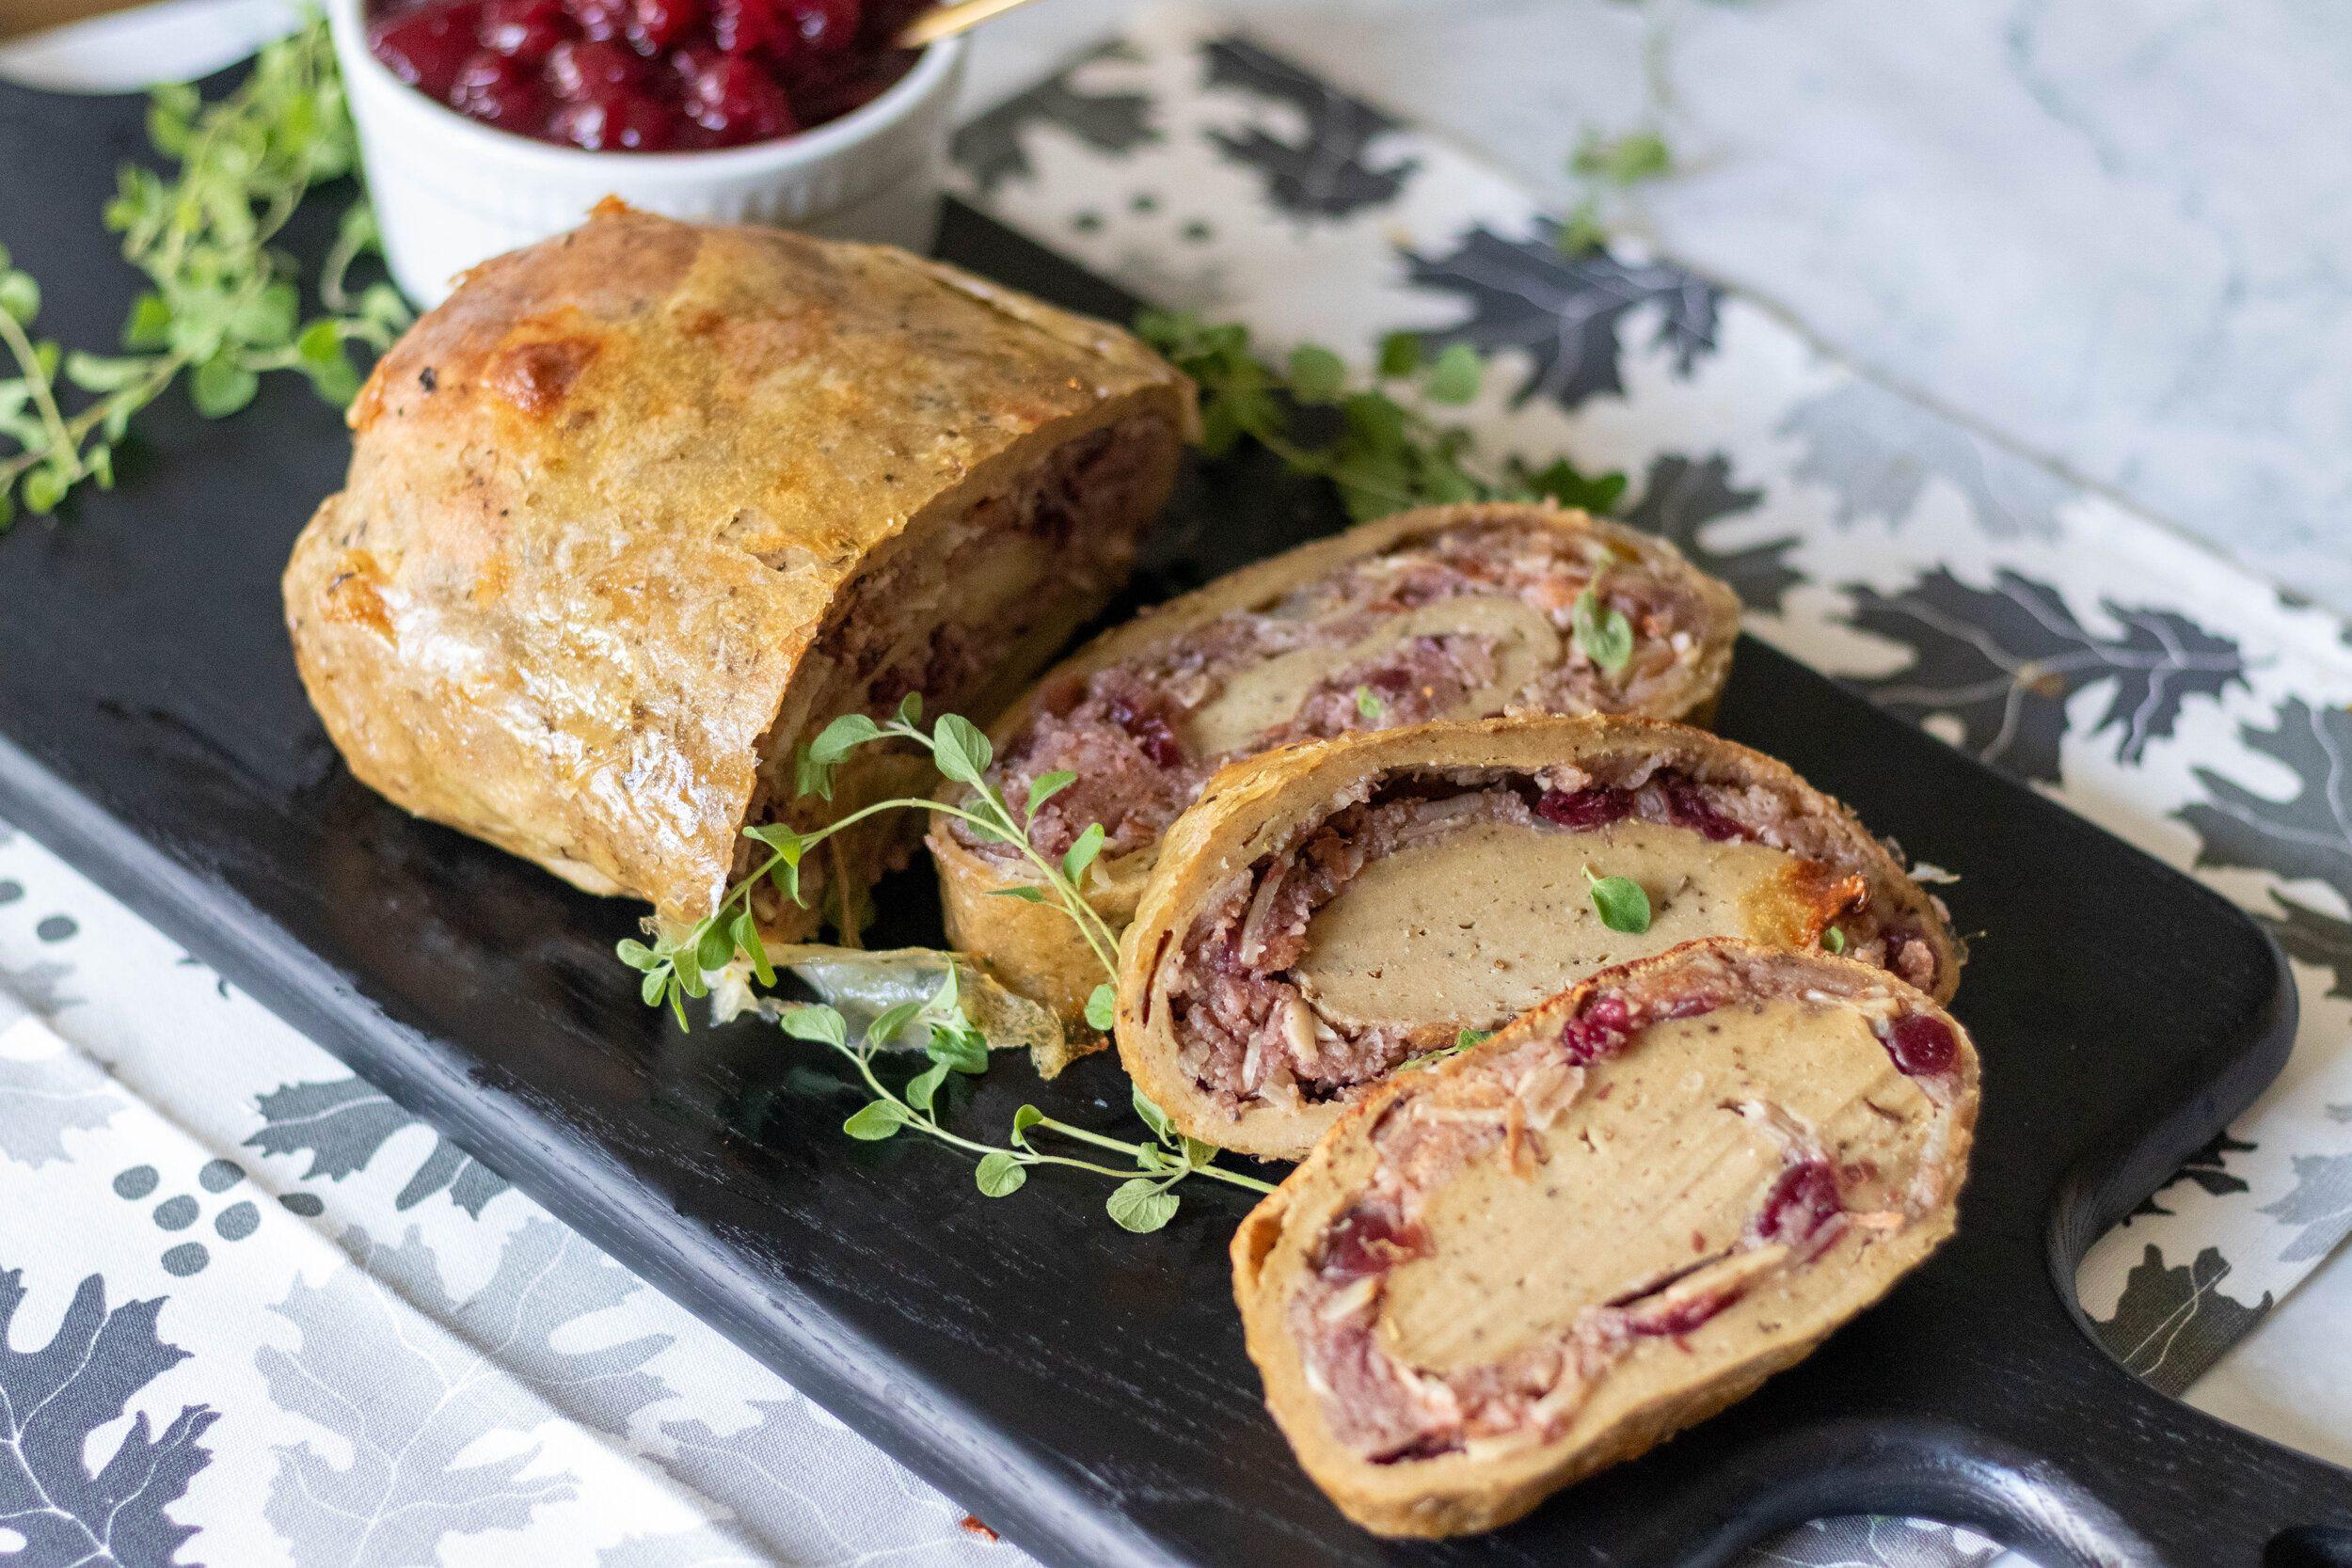 Vegan Cranberry Stuffed Turkey Roast 86 Eats In 2020 Food Processor Recipes Vegan Turkey Roasted Turkey